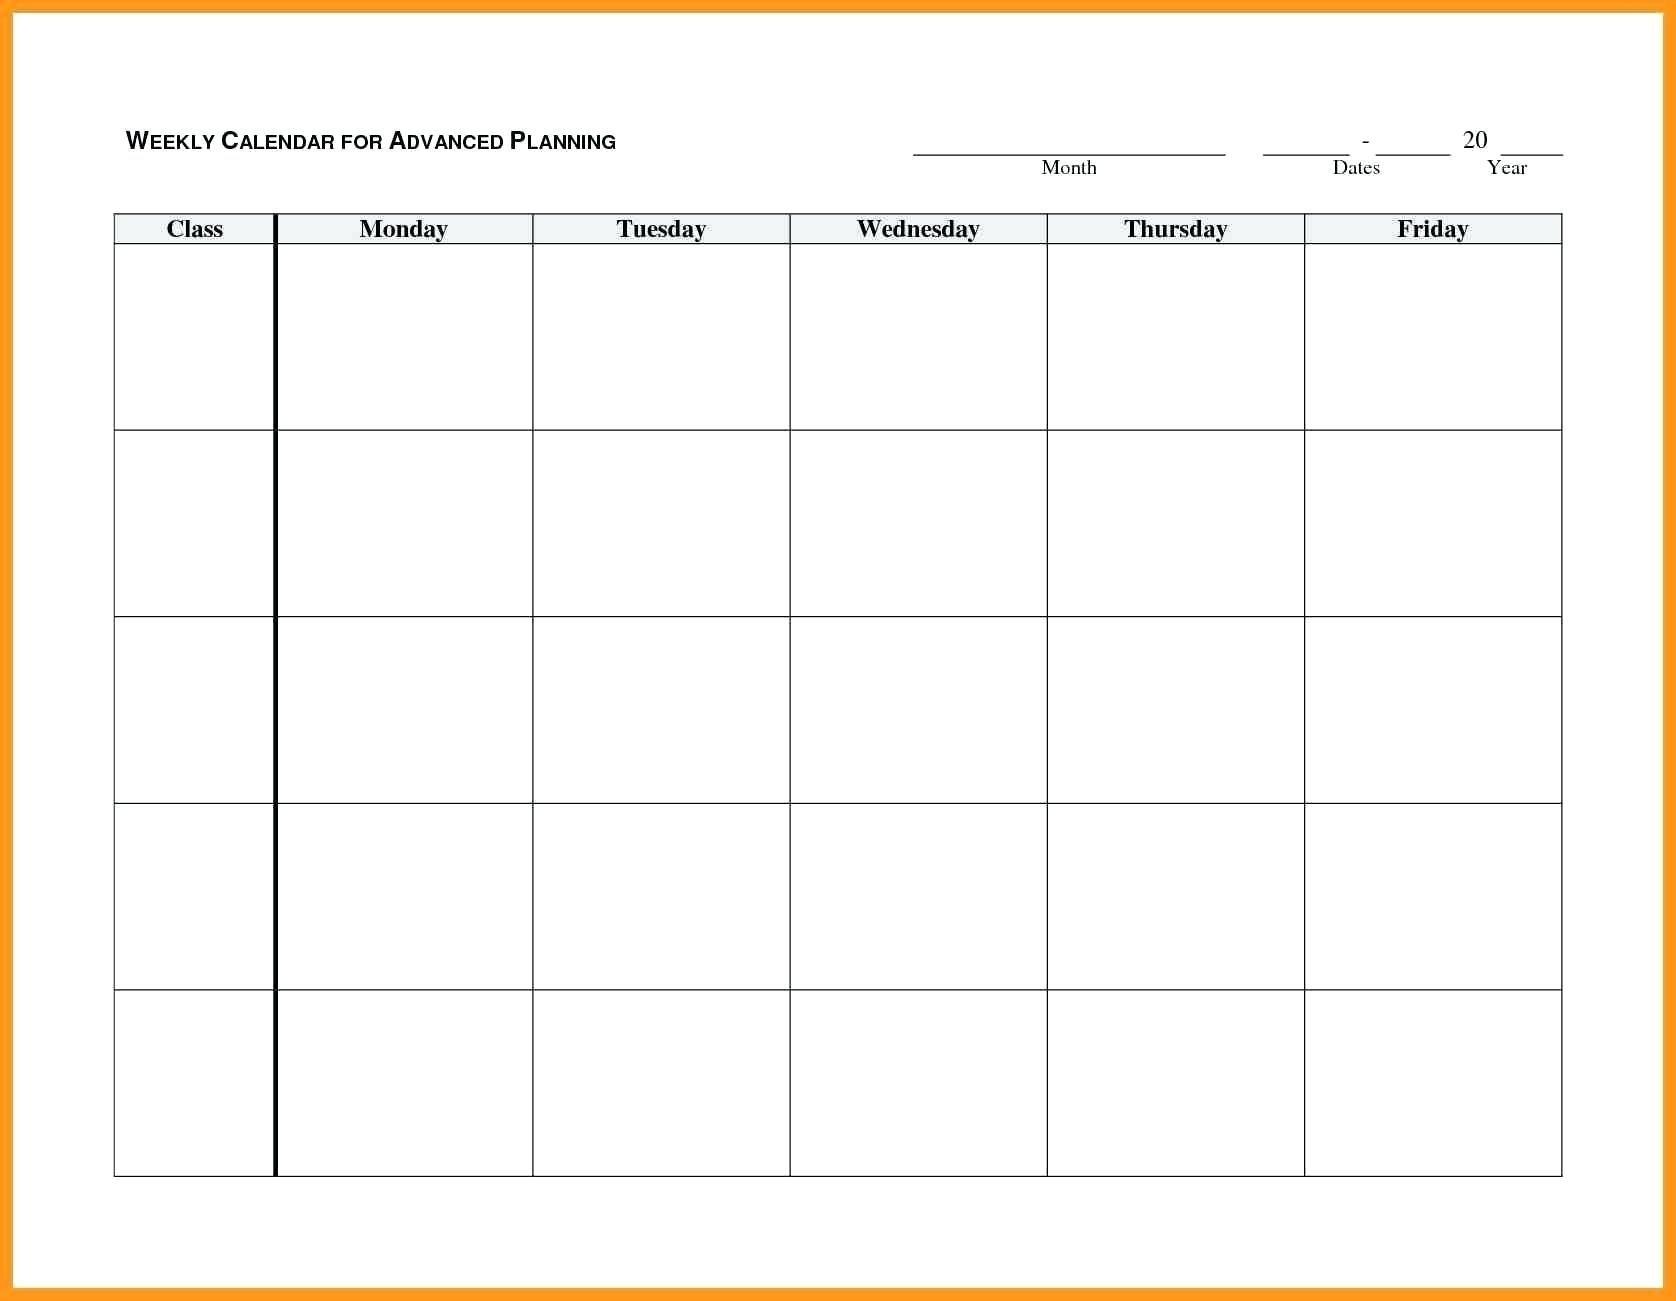 Blank Monday Through Friday Month Calendar Template :-Free Monday To Friday Calender Template